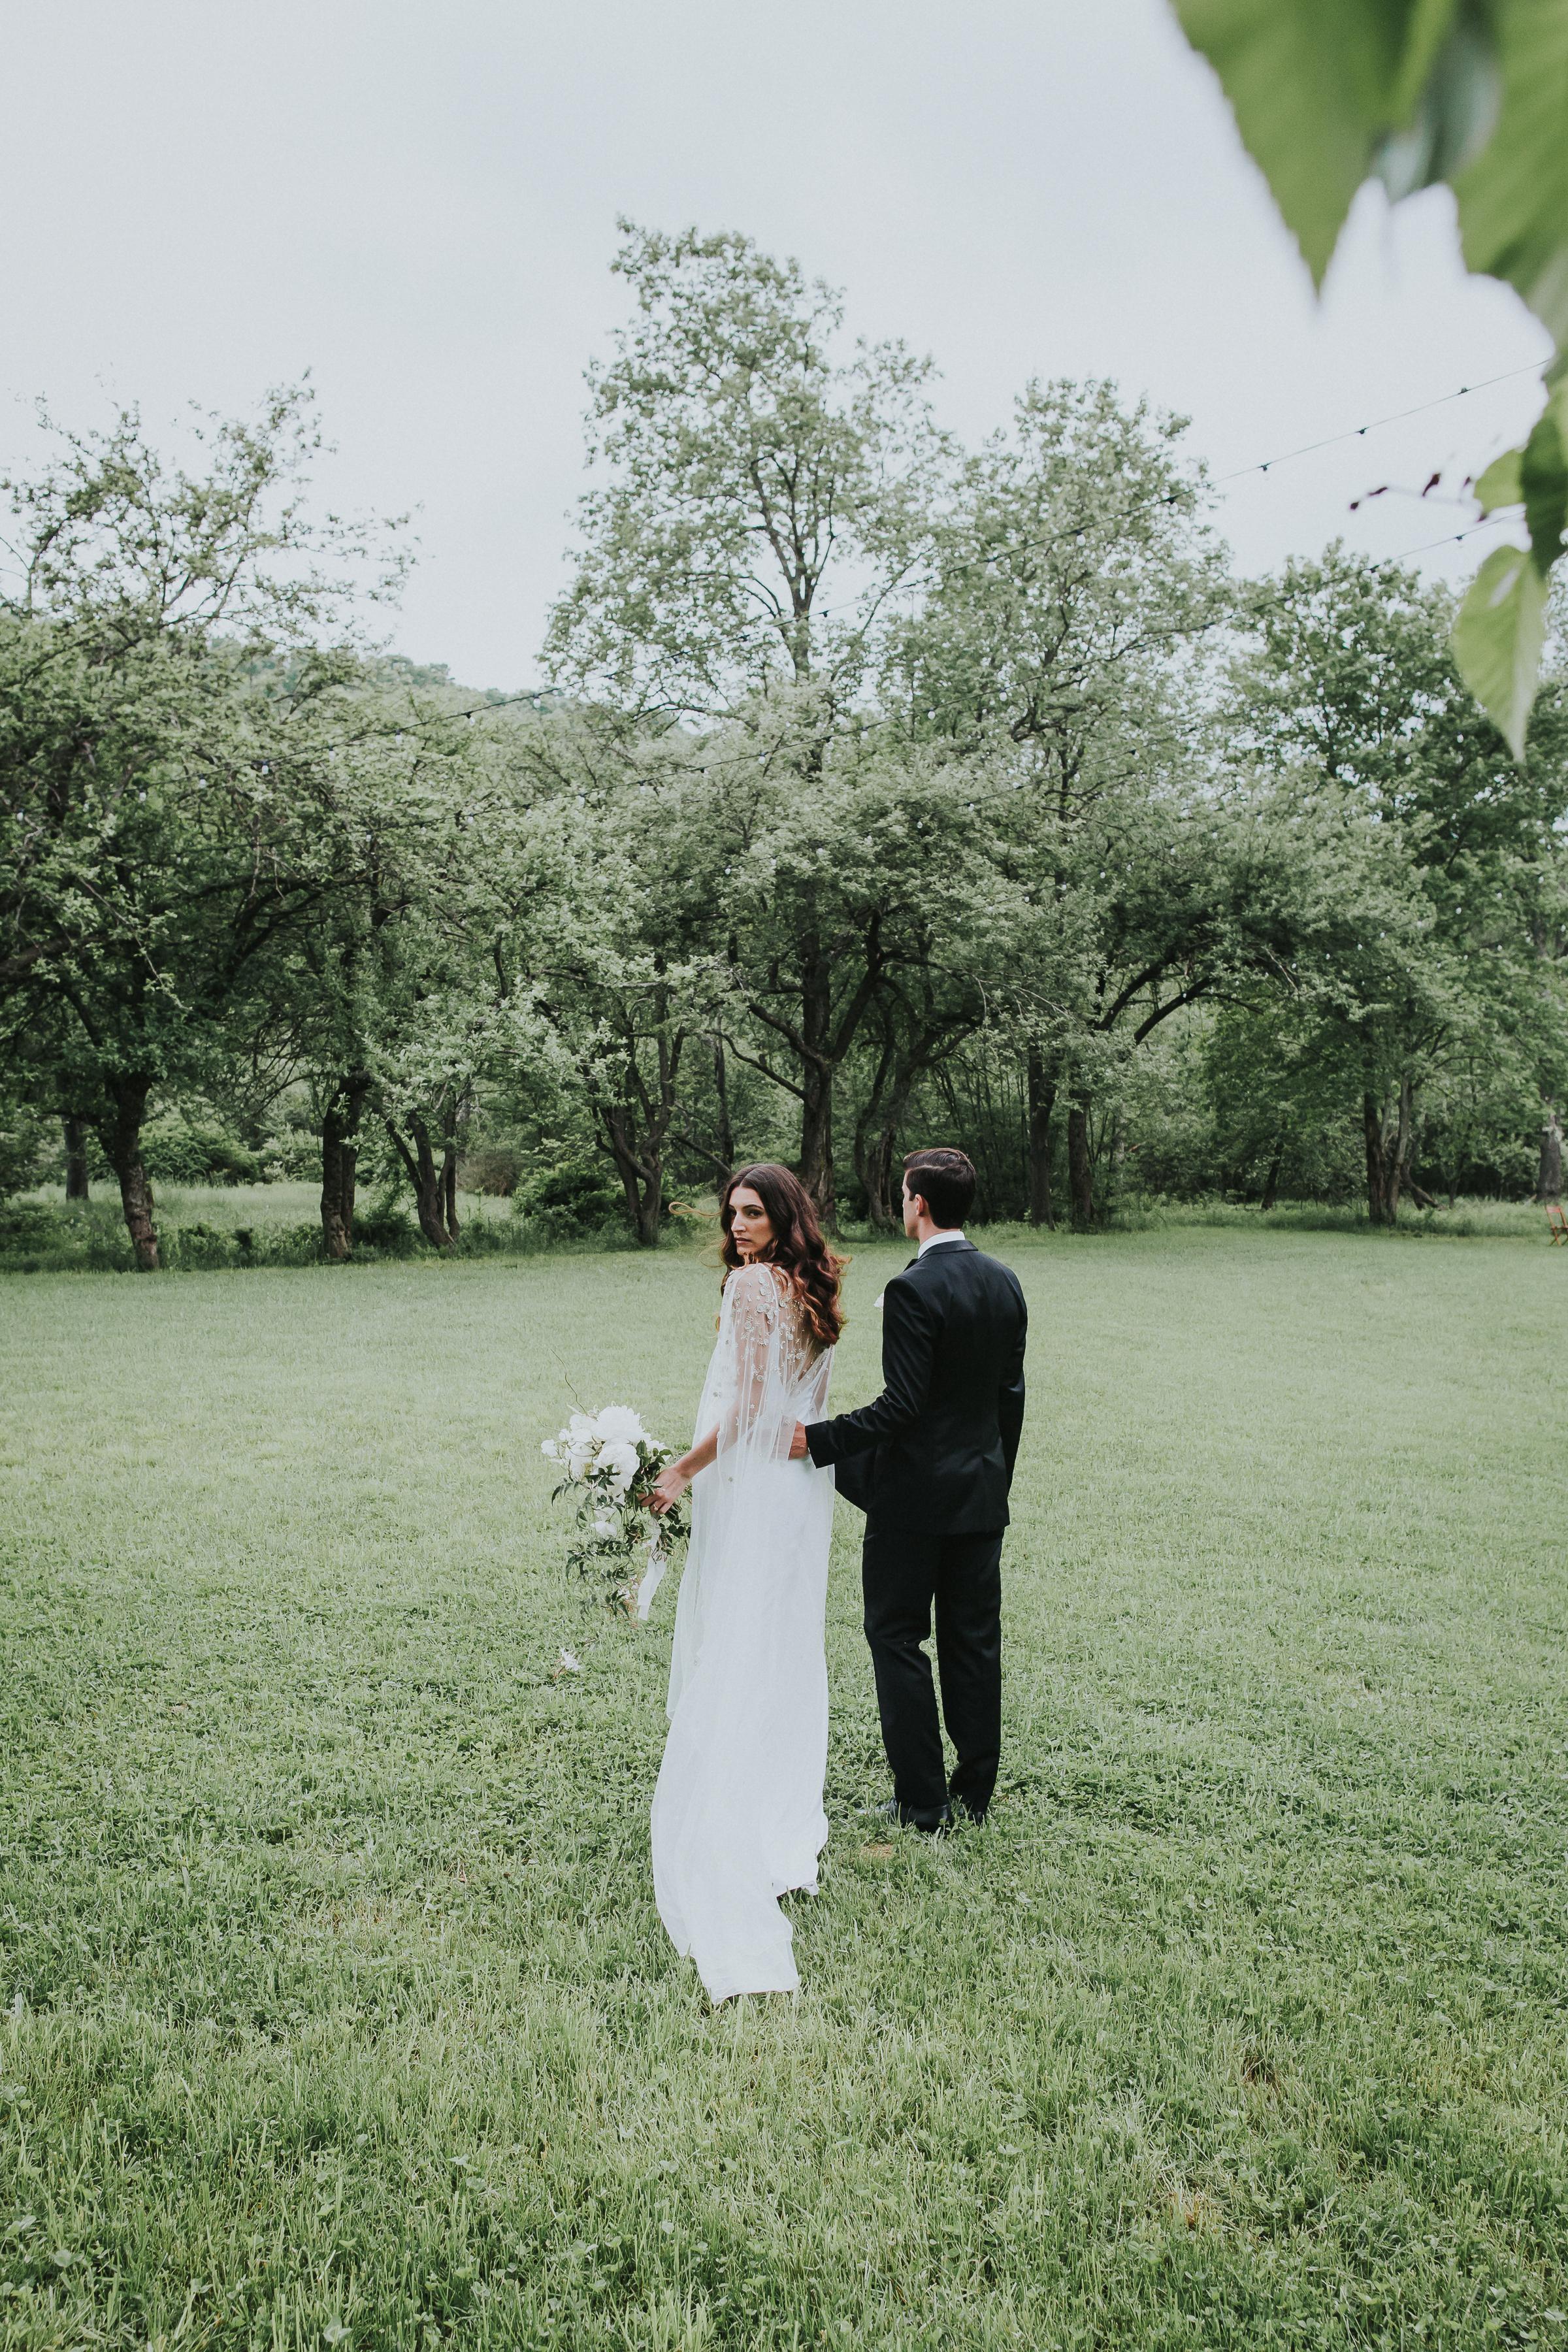 Handsome-Hollow-Long-Eddy-Catskills-New-York-Fine-Art-Documentary-Wedding-Photographer-38.jpg